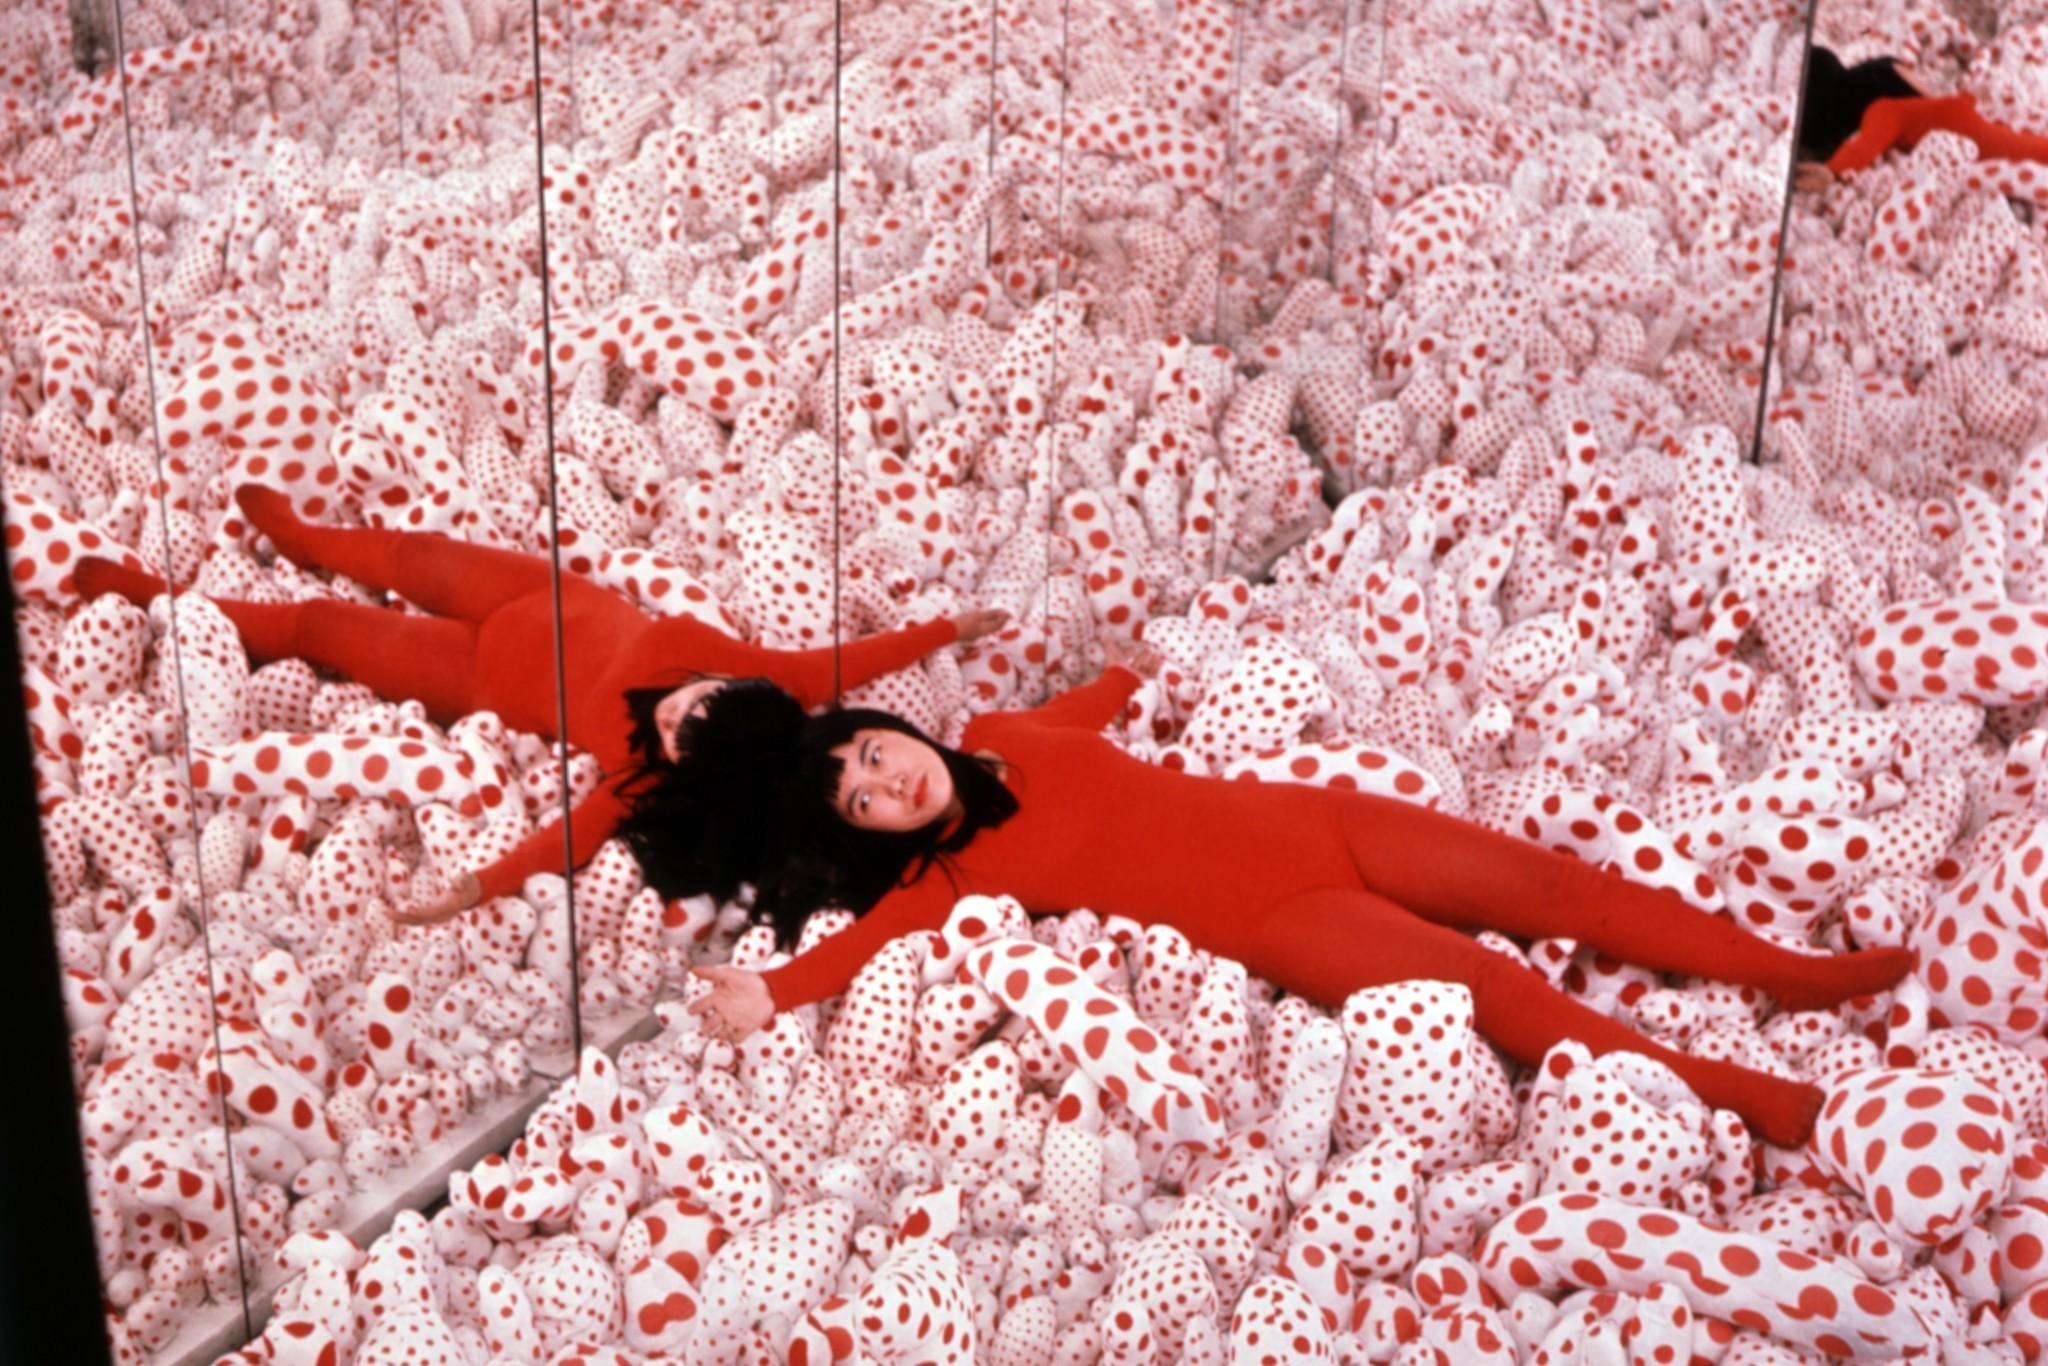 'Priestess Of Polka Dots' Yayoi Kusama Gives Gallerygoers A Taste Of Infinity